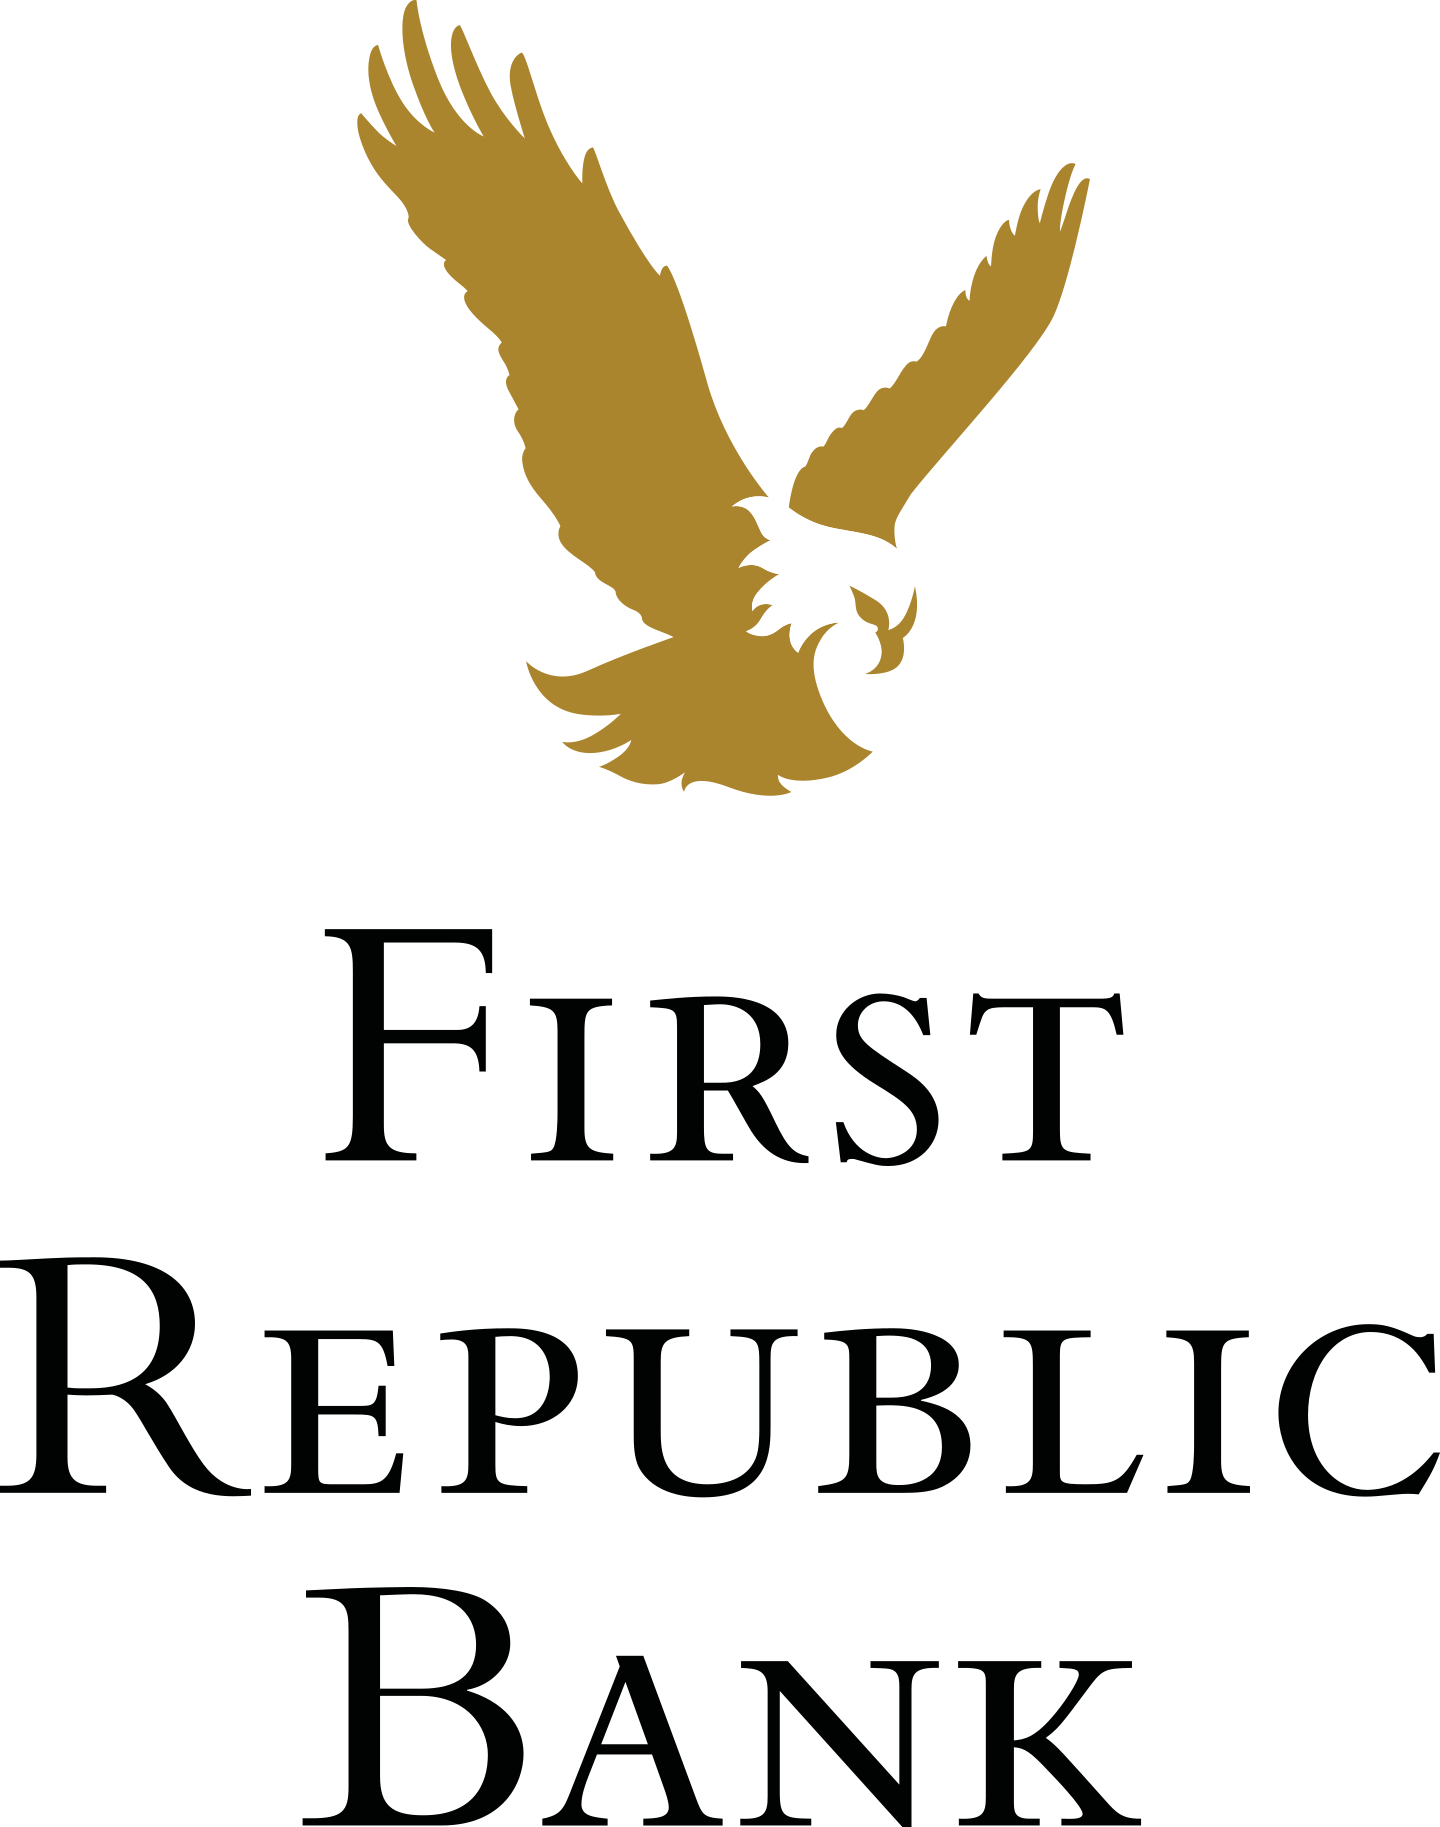 first republic bank logo 3 - First Republic Bank Logo